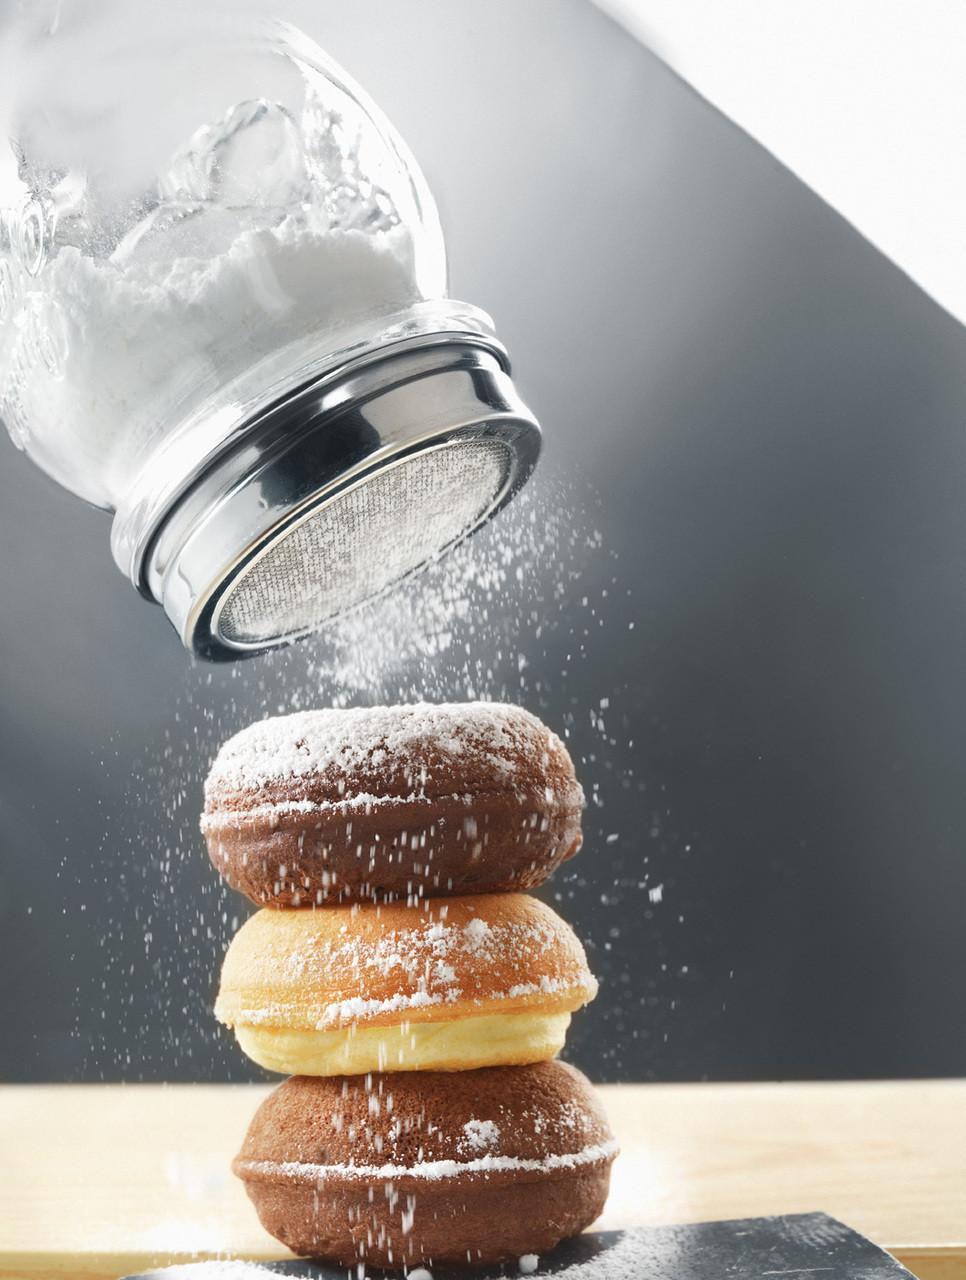 Sprinkle powdered sugar from the jar.